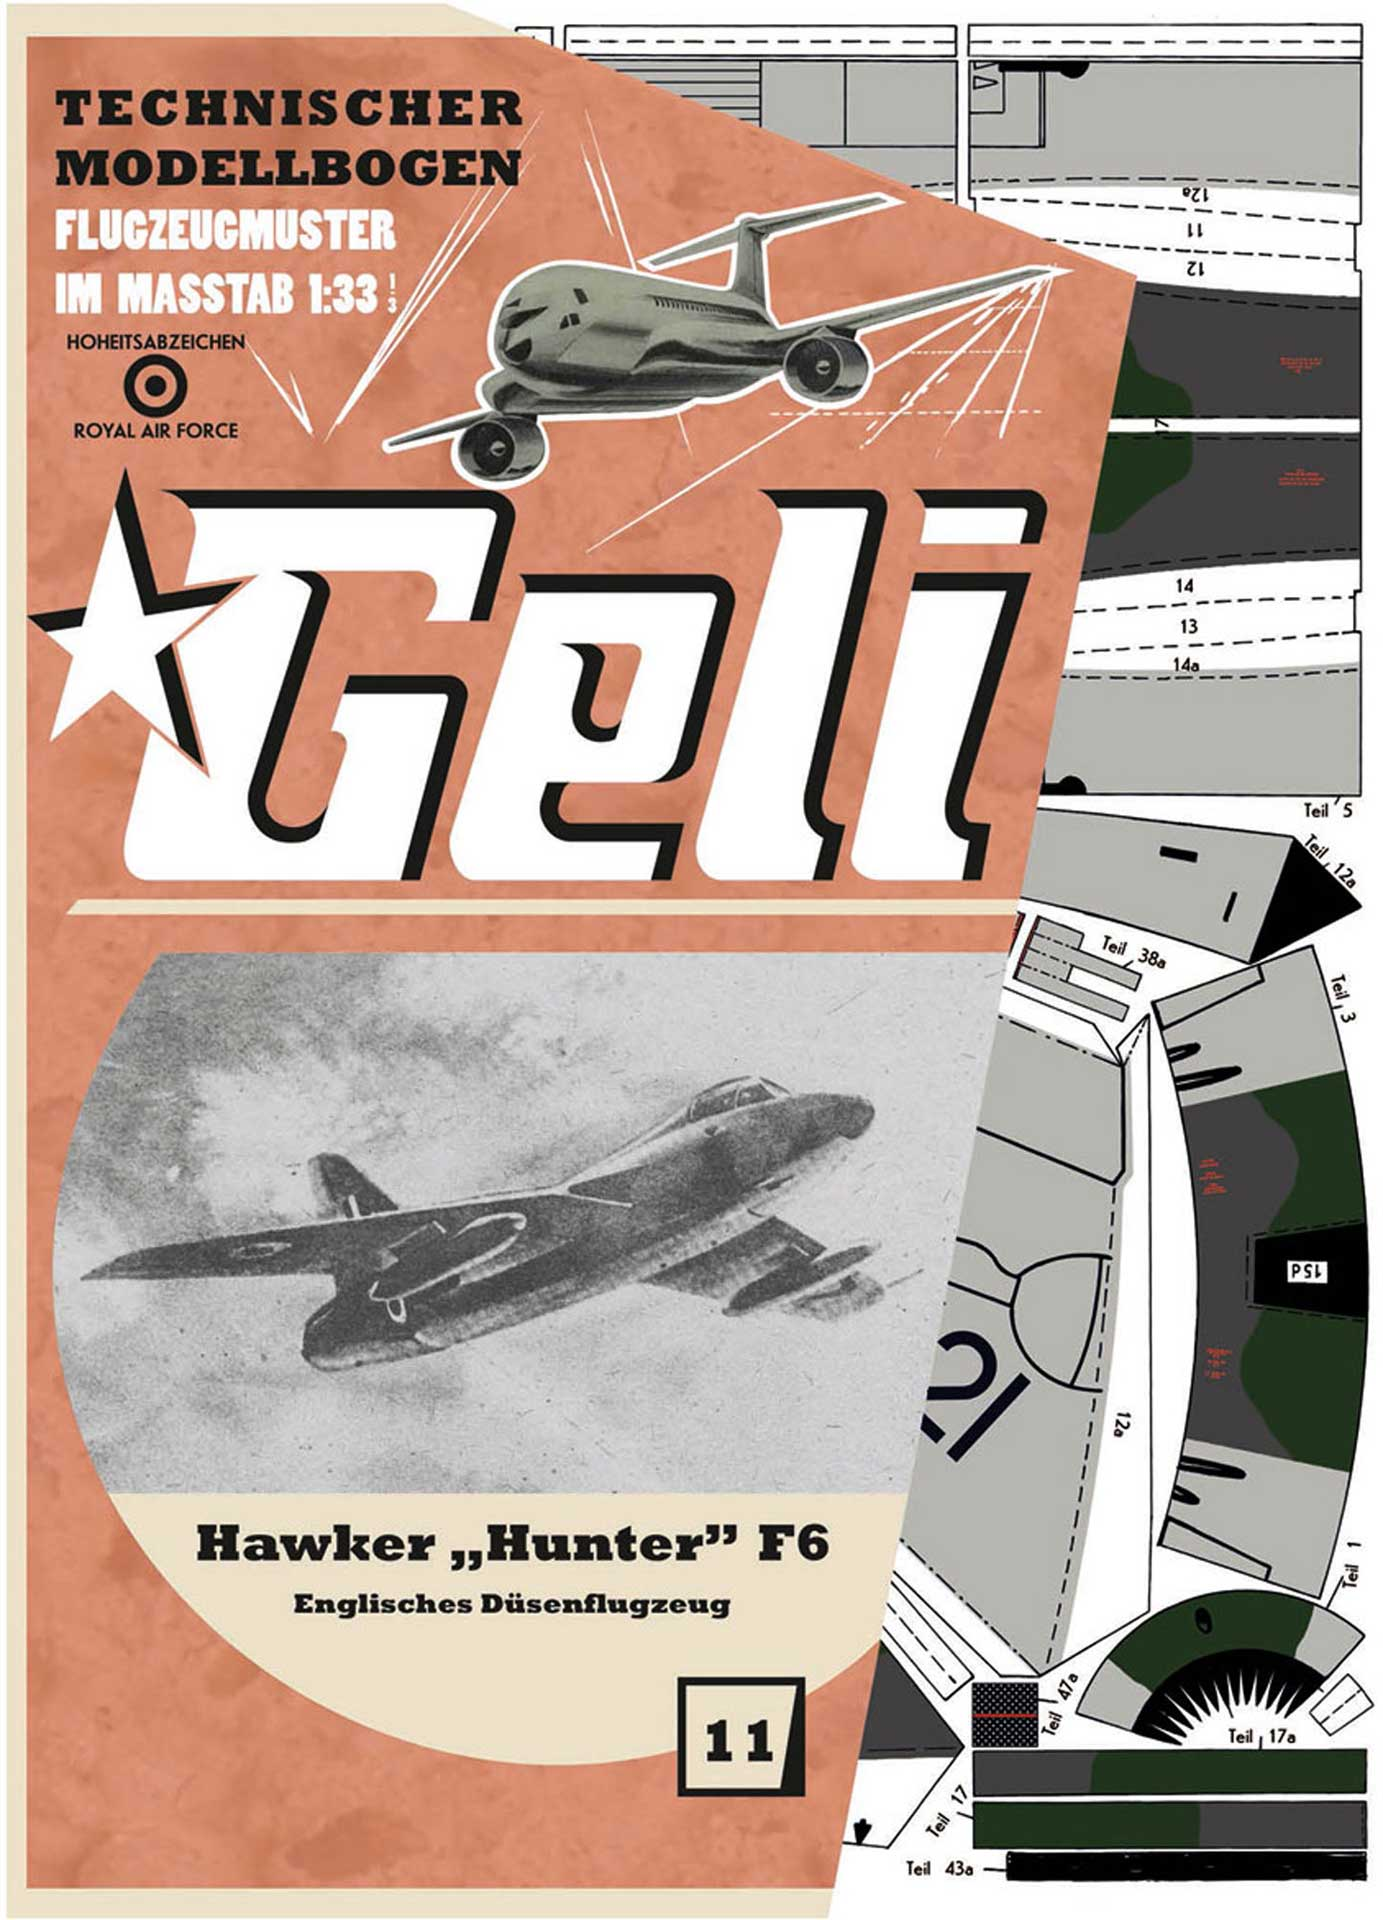 GELI HAWKER HUNTER F6 KARTONMODELL